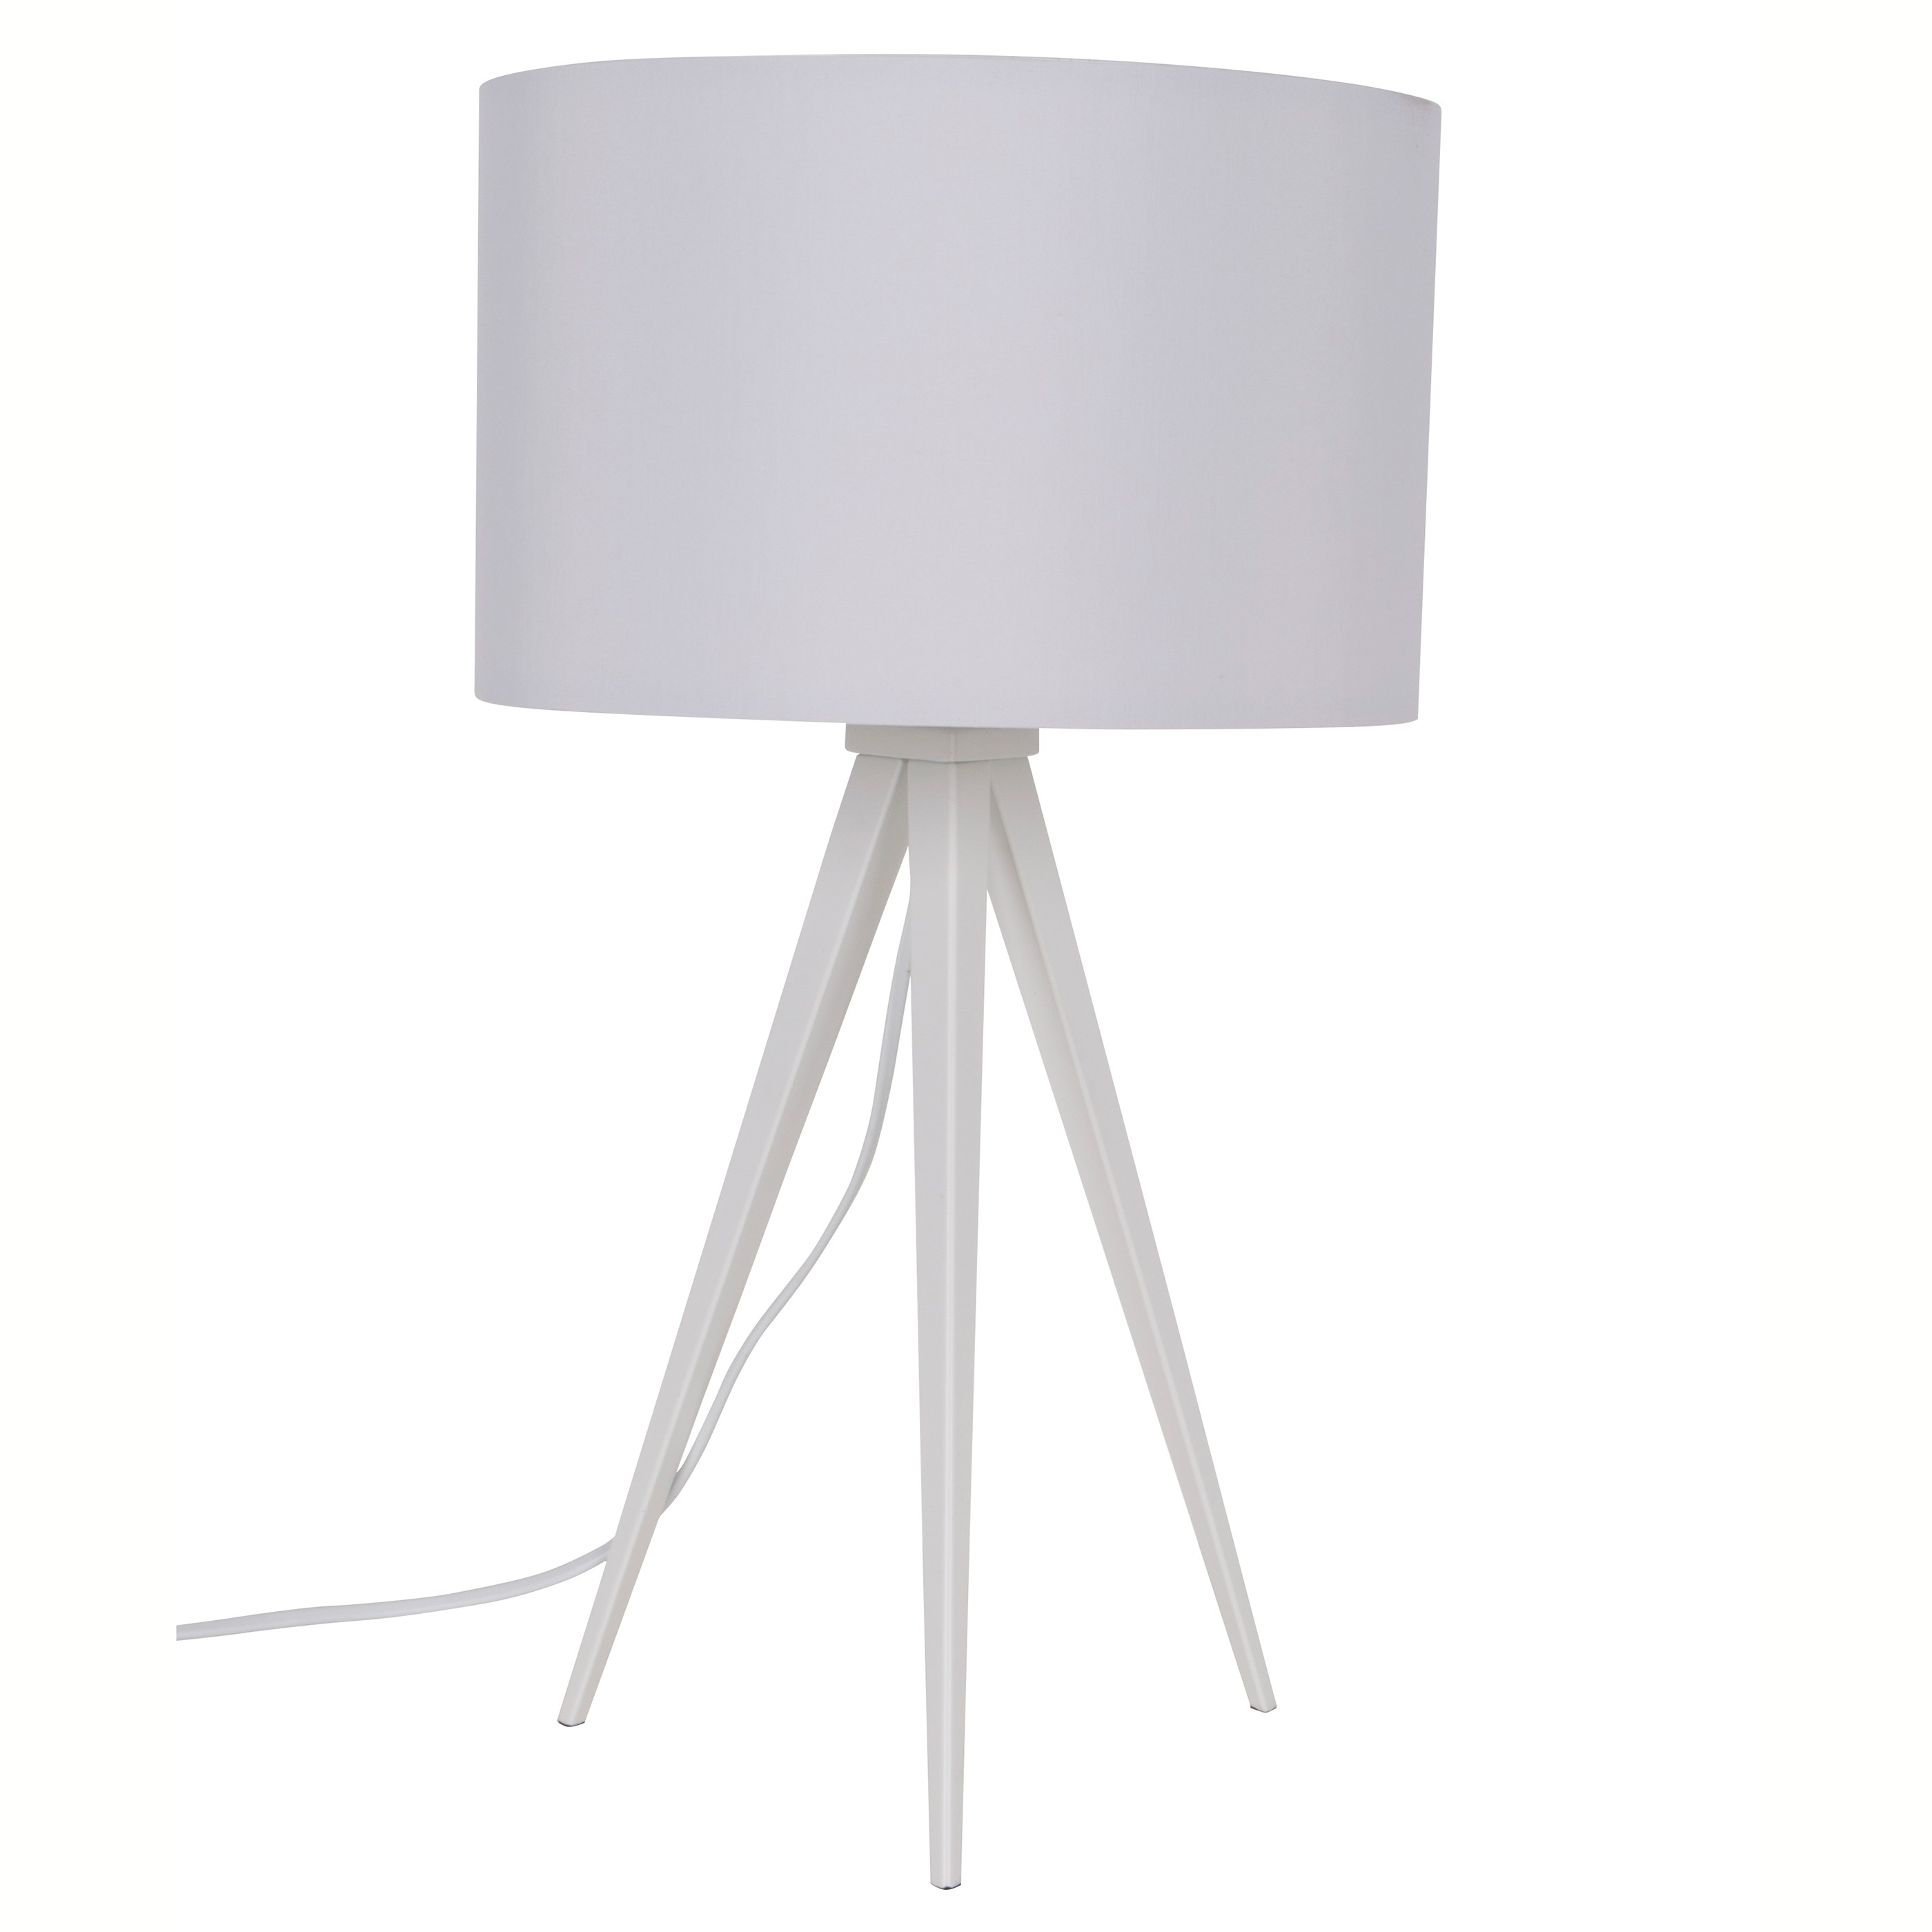 zui 5200007 Zuiver Tripod tafellamp wit